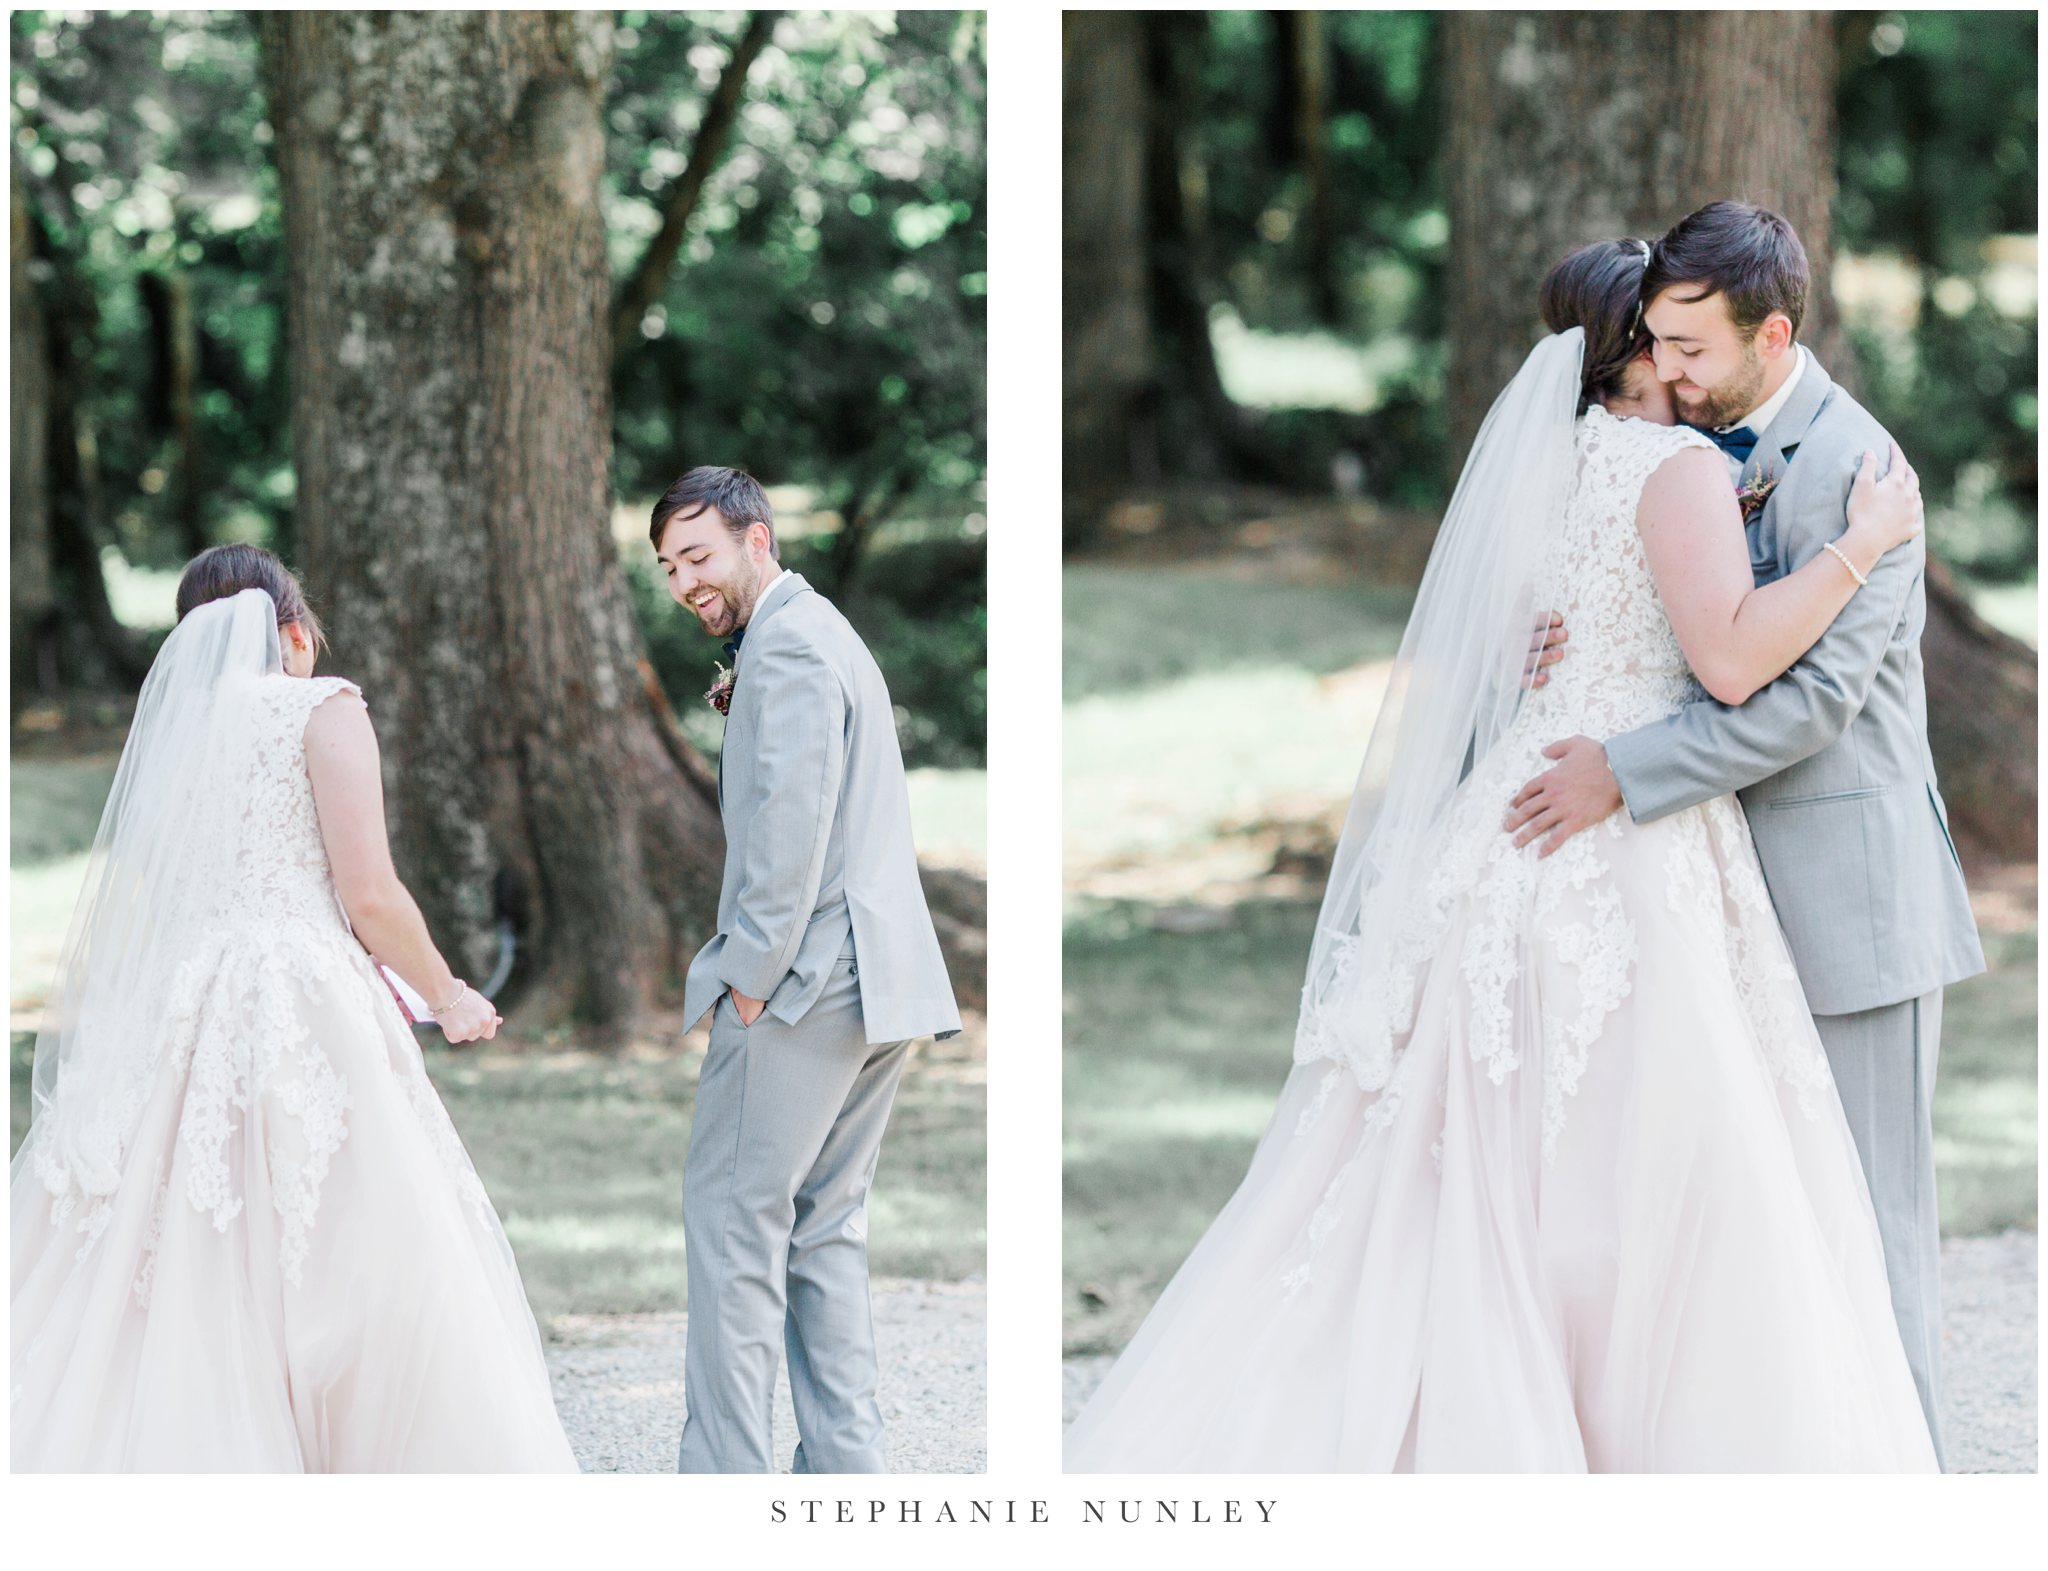 arkansas-wedding-with-lush-wildflower-bouquet-0036.jpg